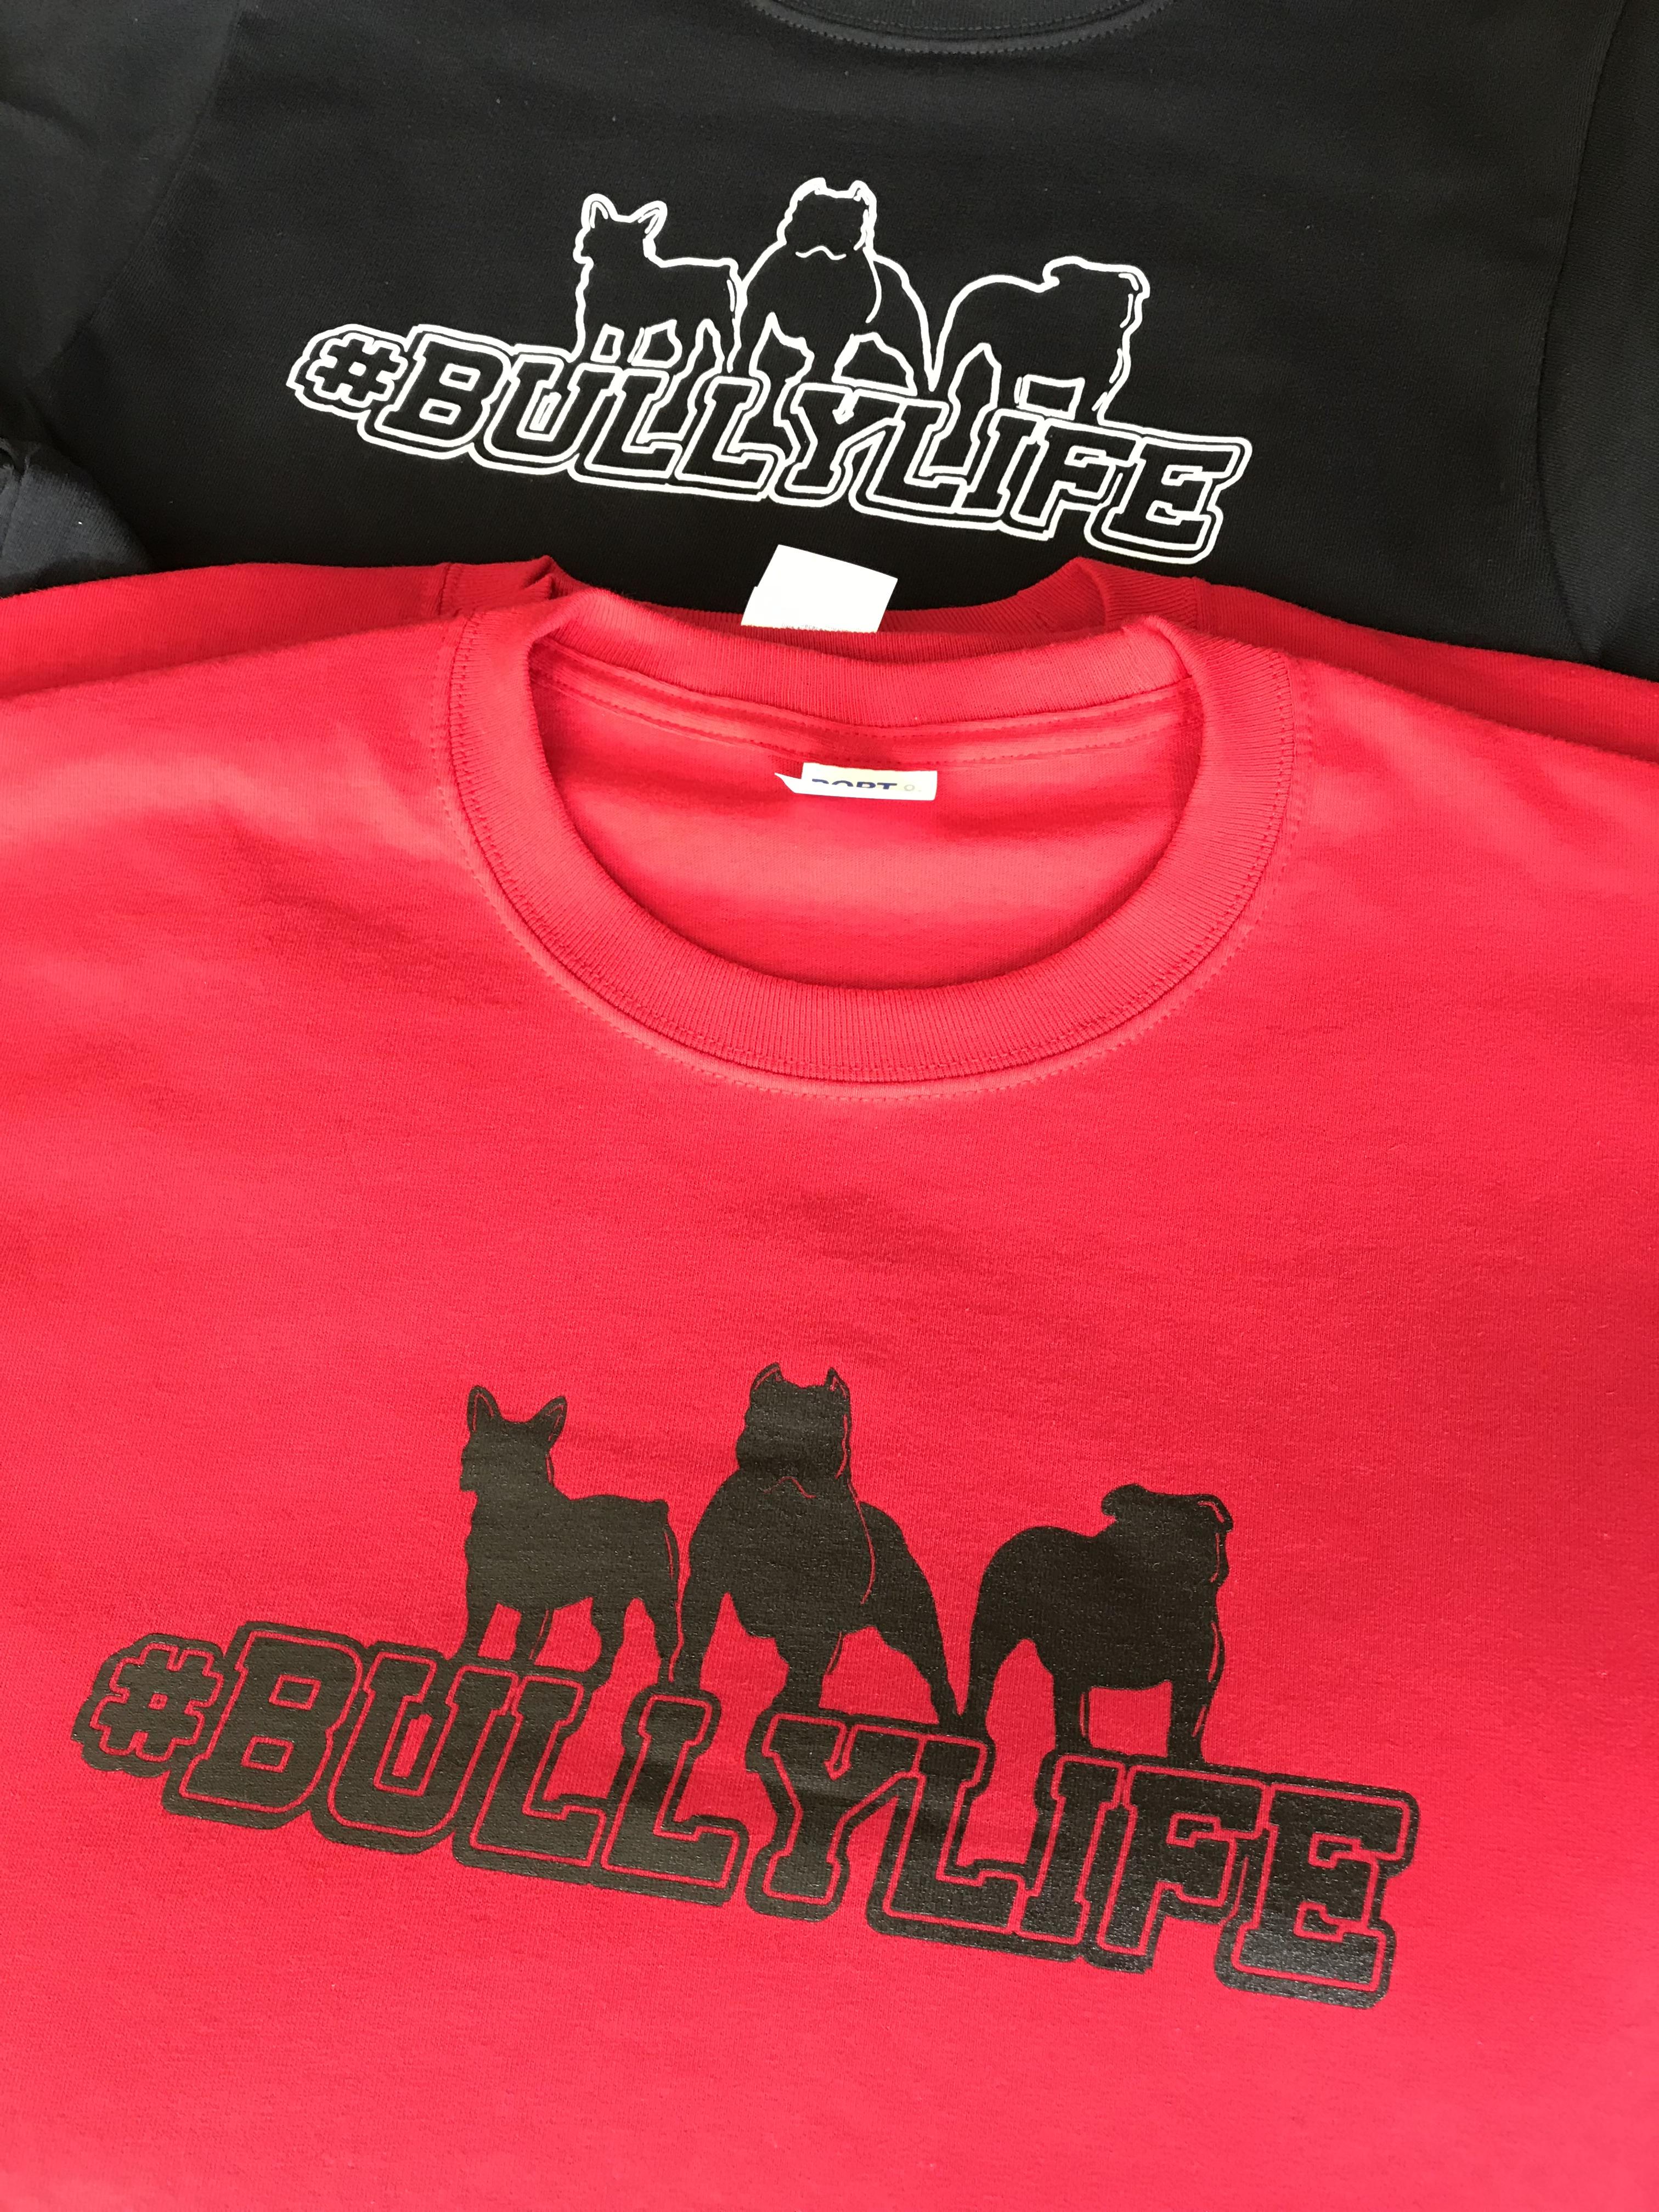 #bullylife